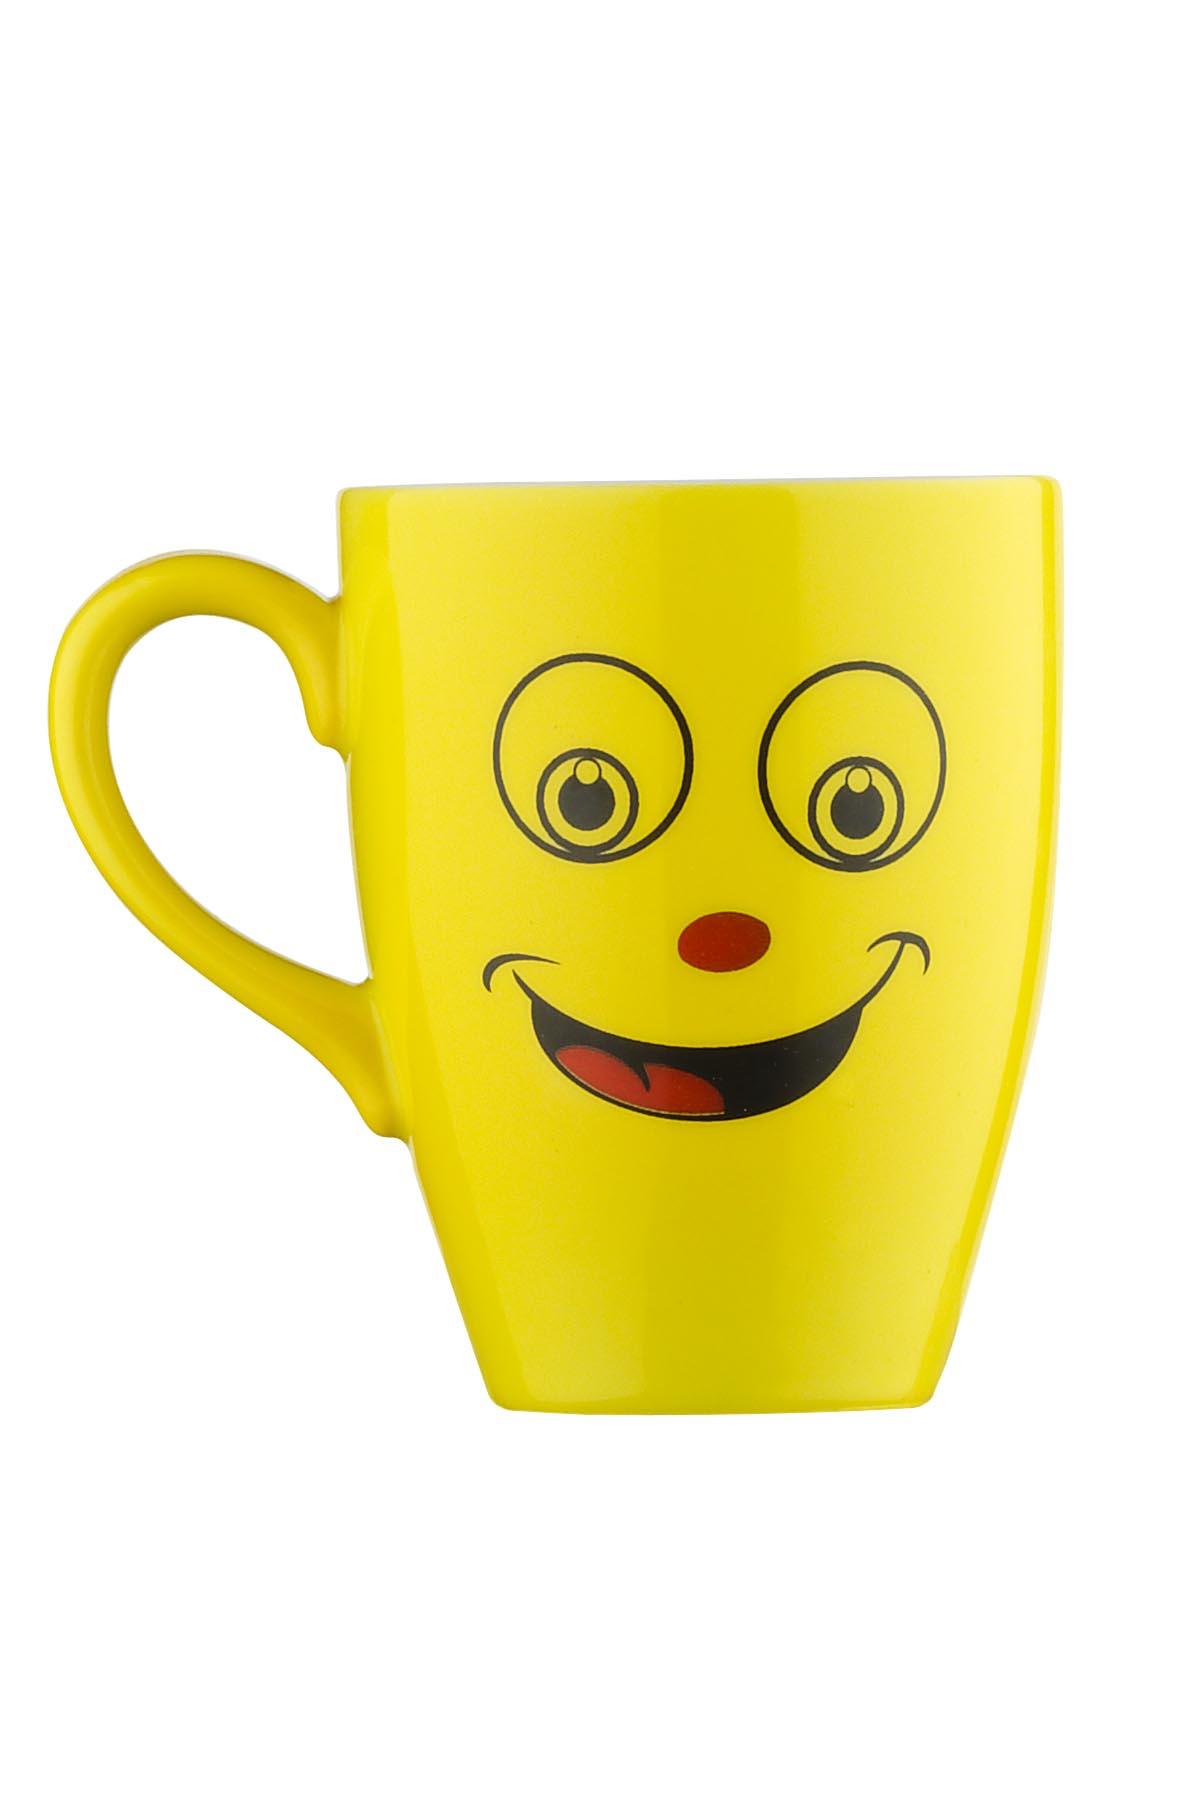 Kütahya Porselen Lima Emoji Mug Bardak